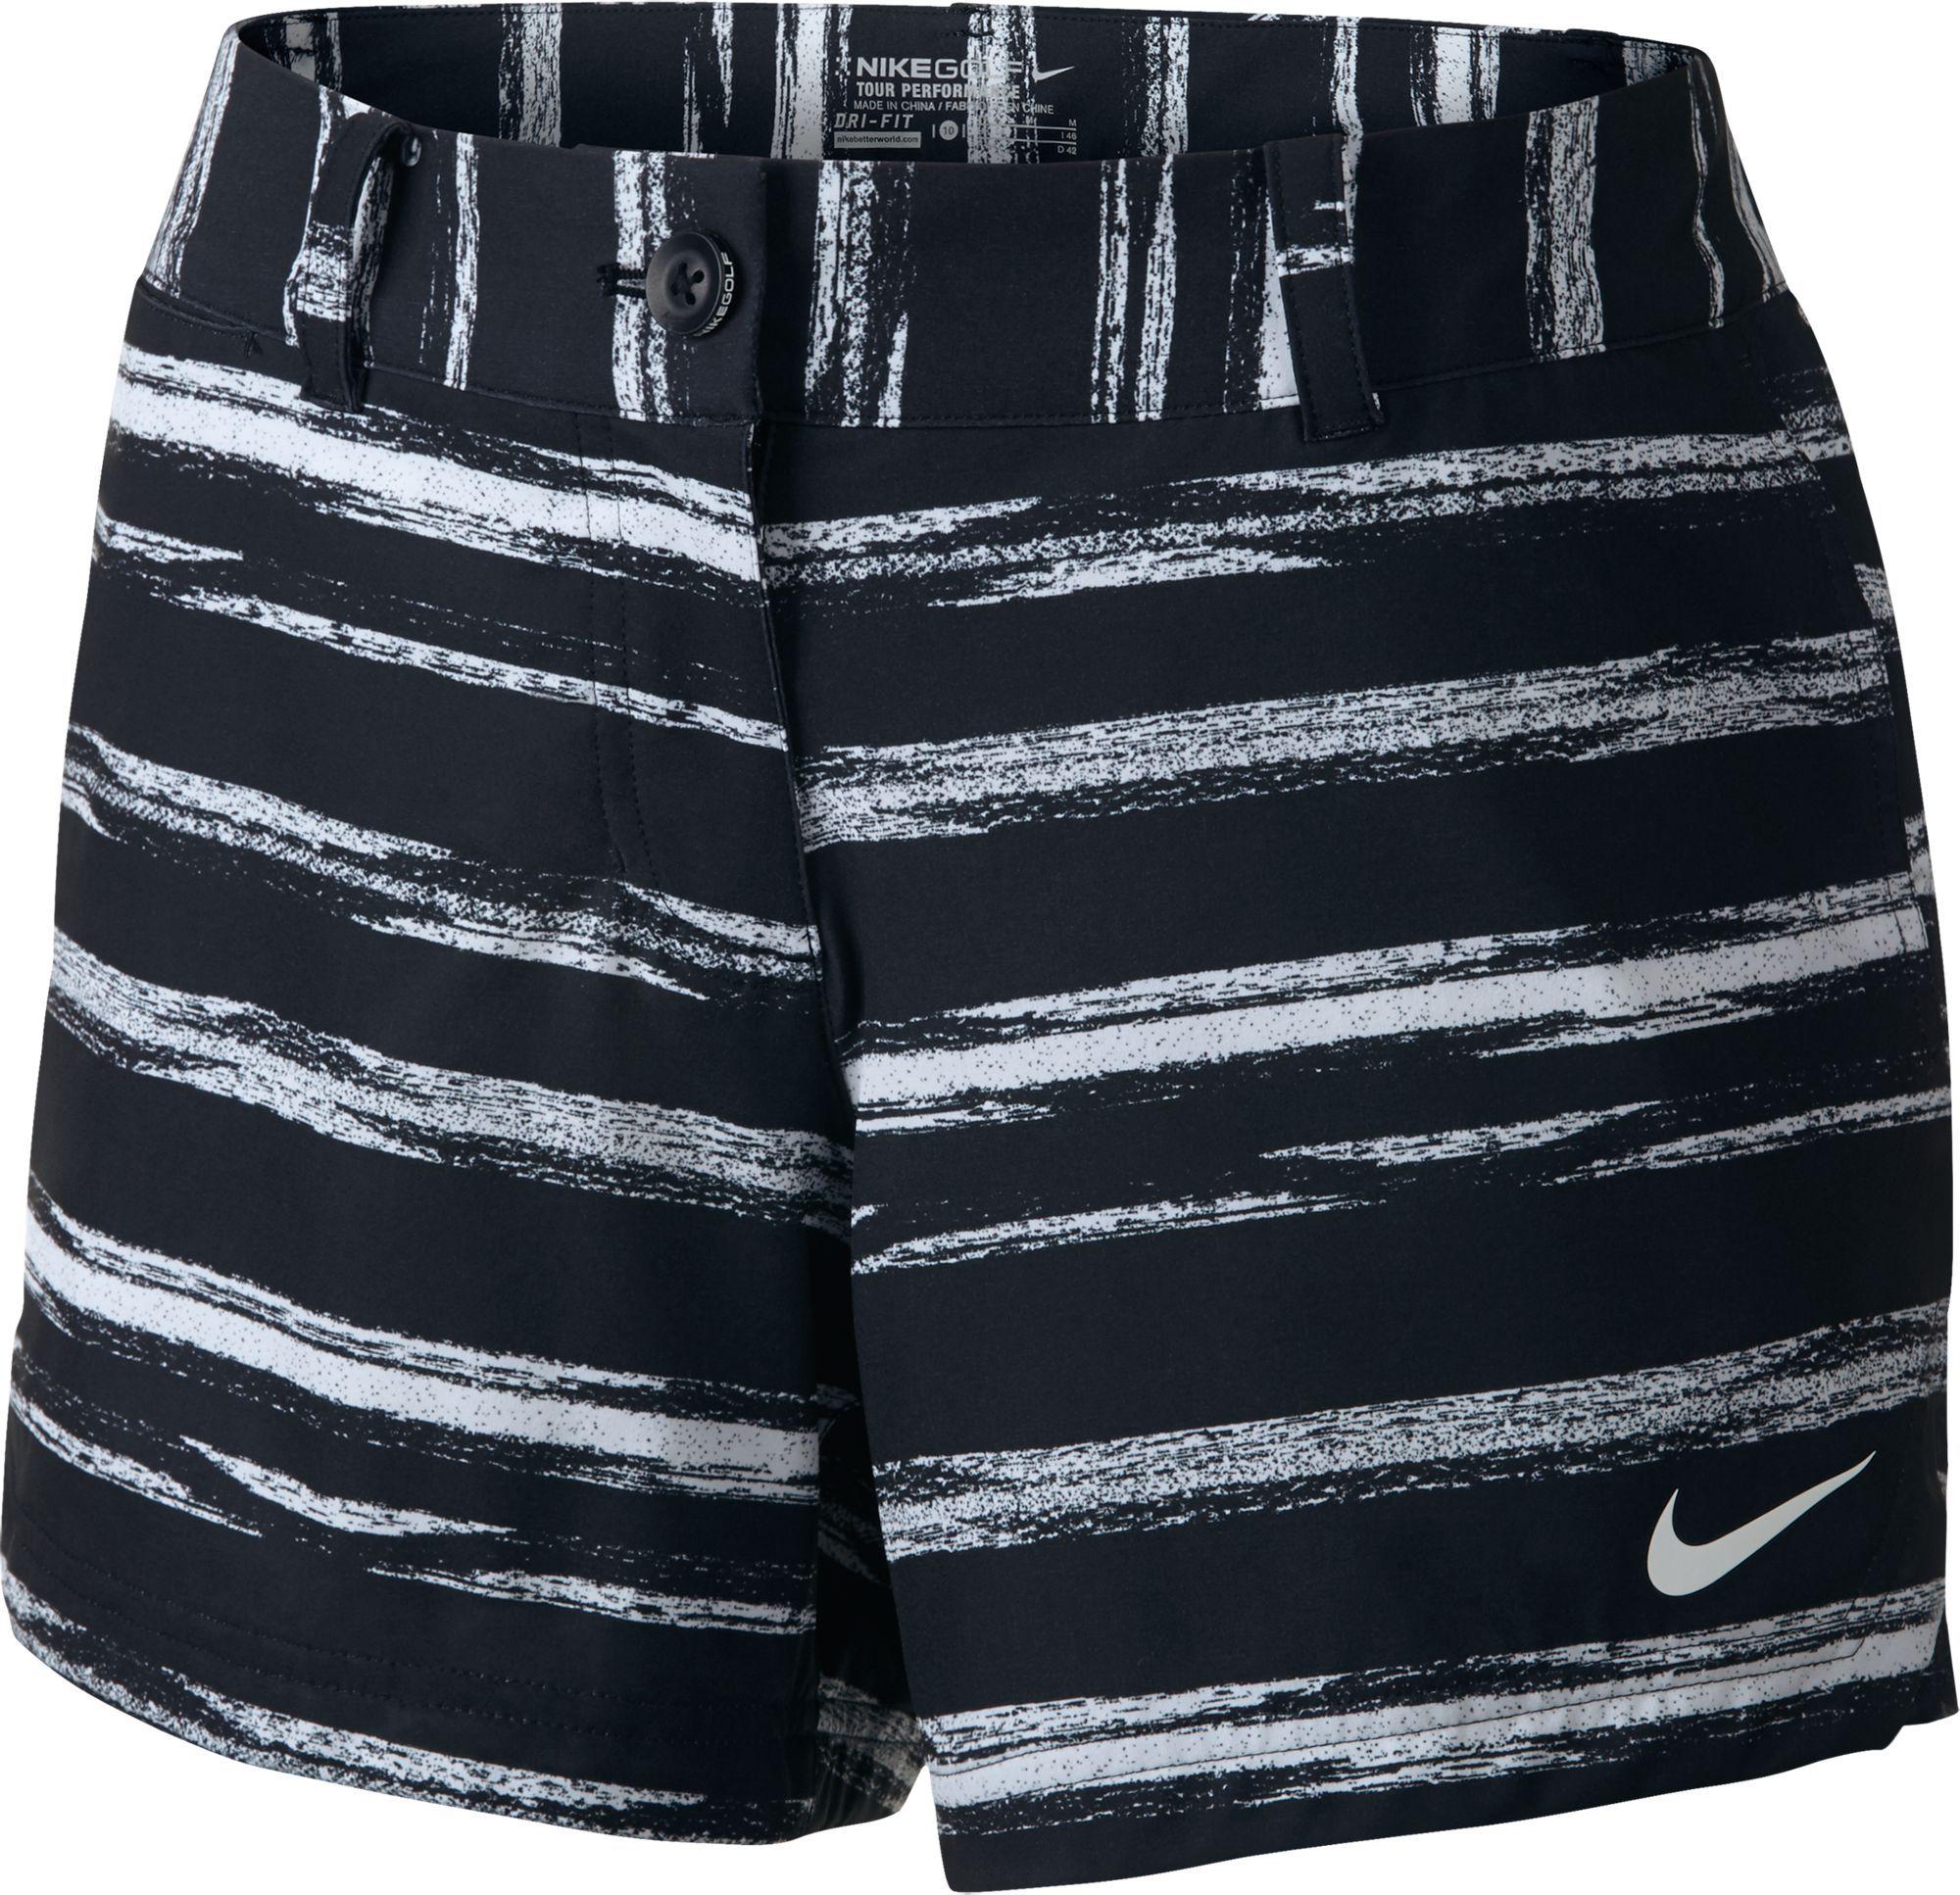 Nike Women S Greens Shorty Shorts Golf Net Golf Tips Golf Outfit